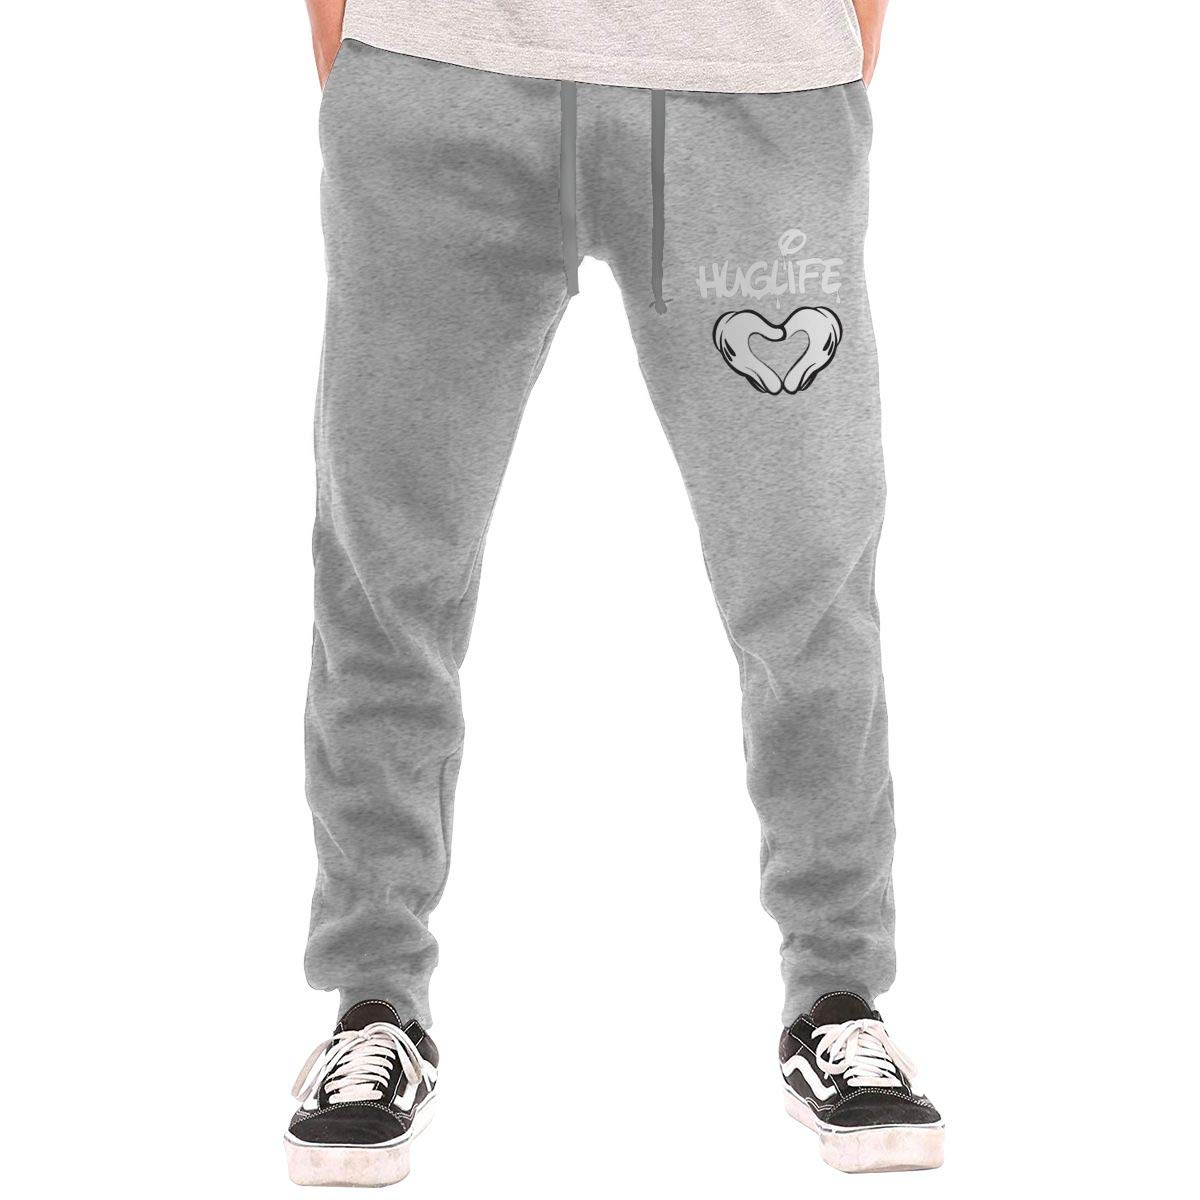 Sunshine Shop Hug Life Mens Elastic Personality Pattern Casual Trousers